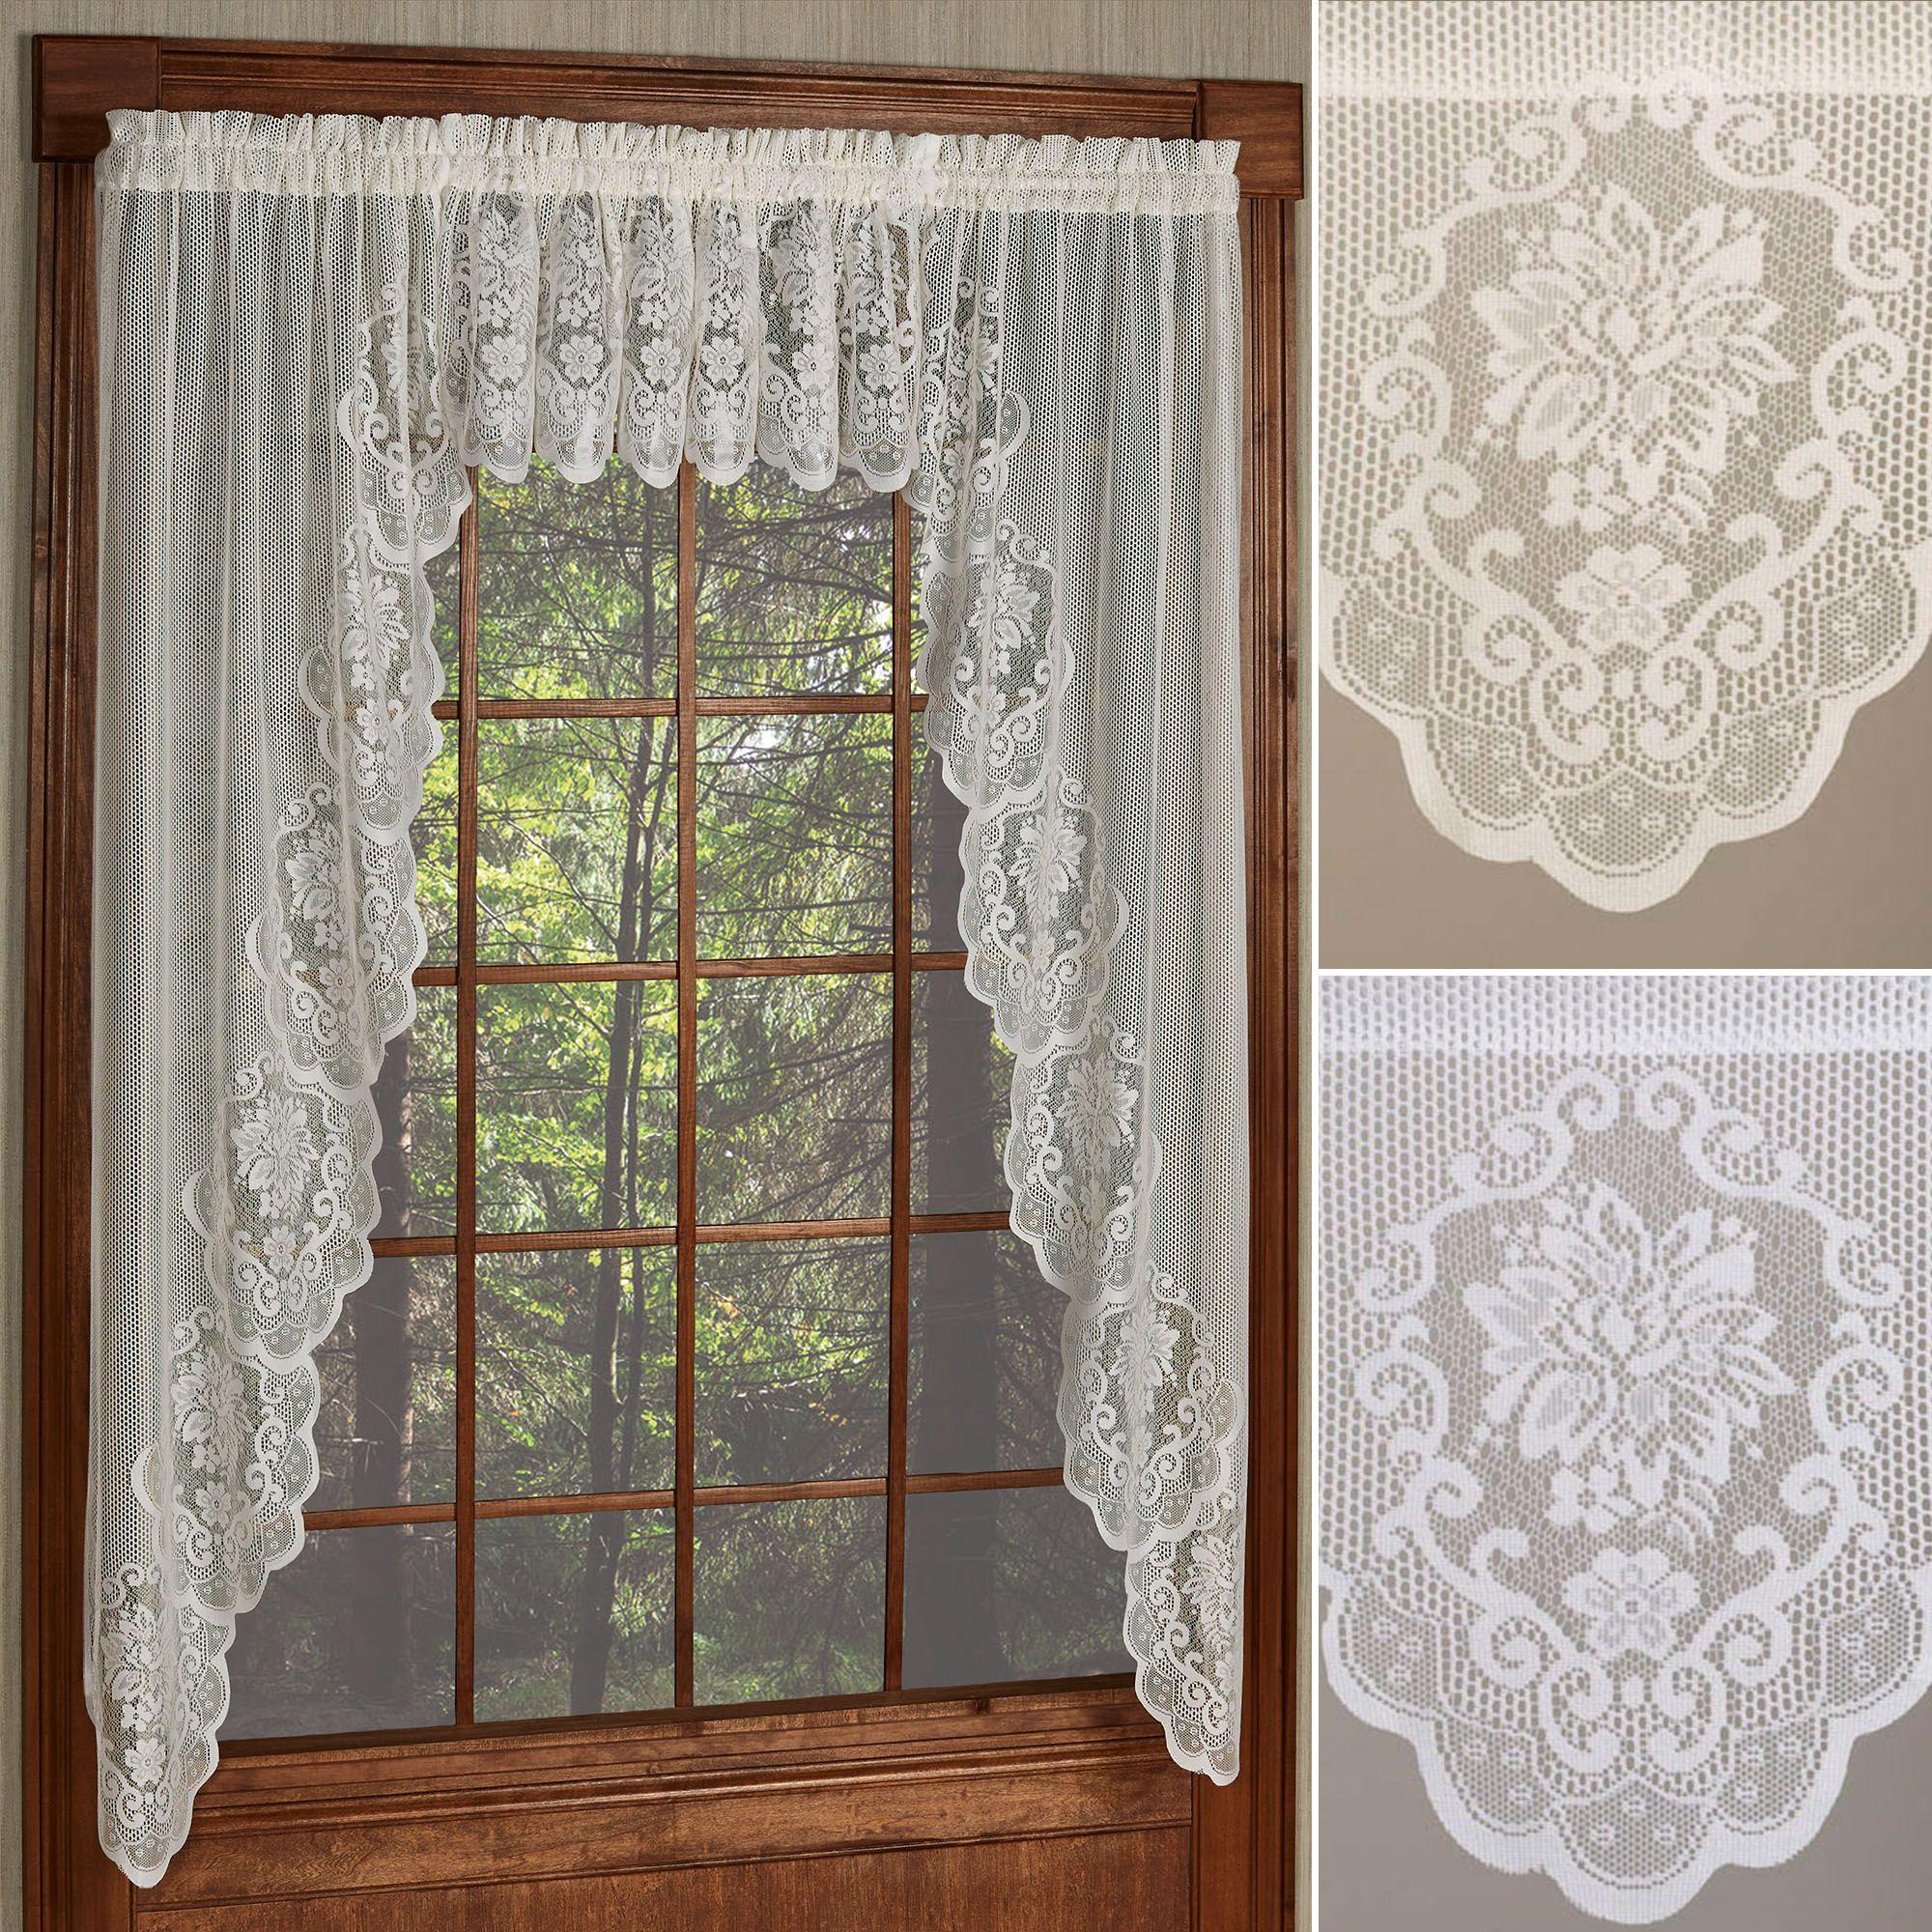 Fairmount Lace Window Valances